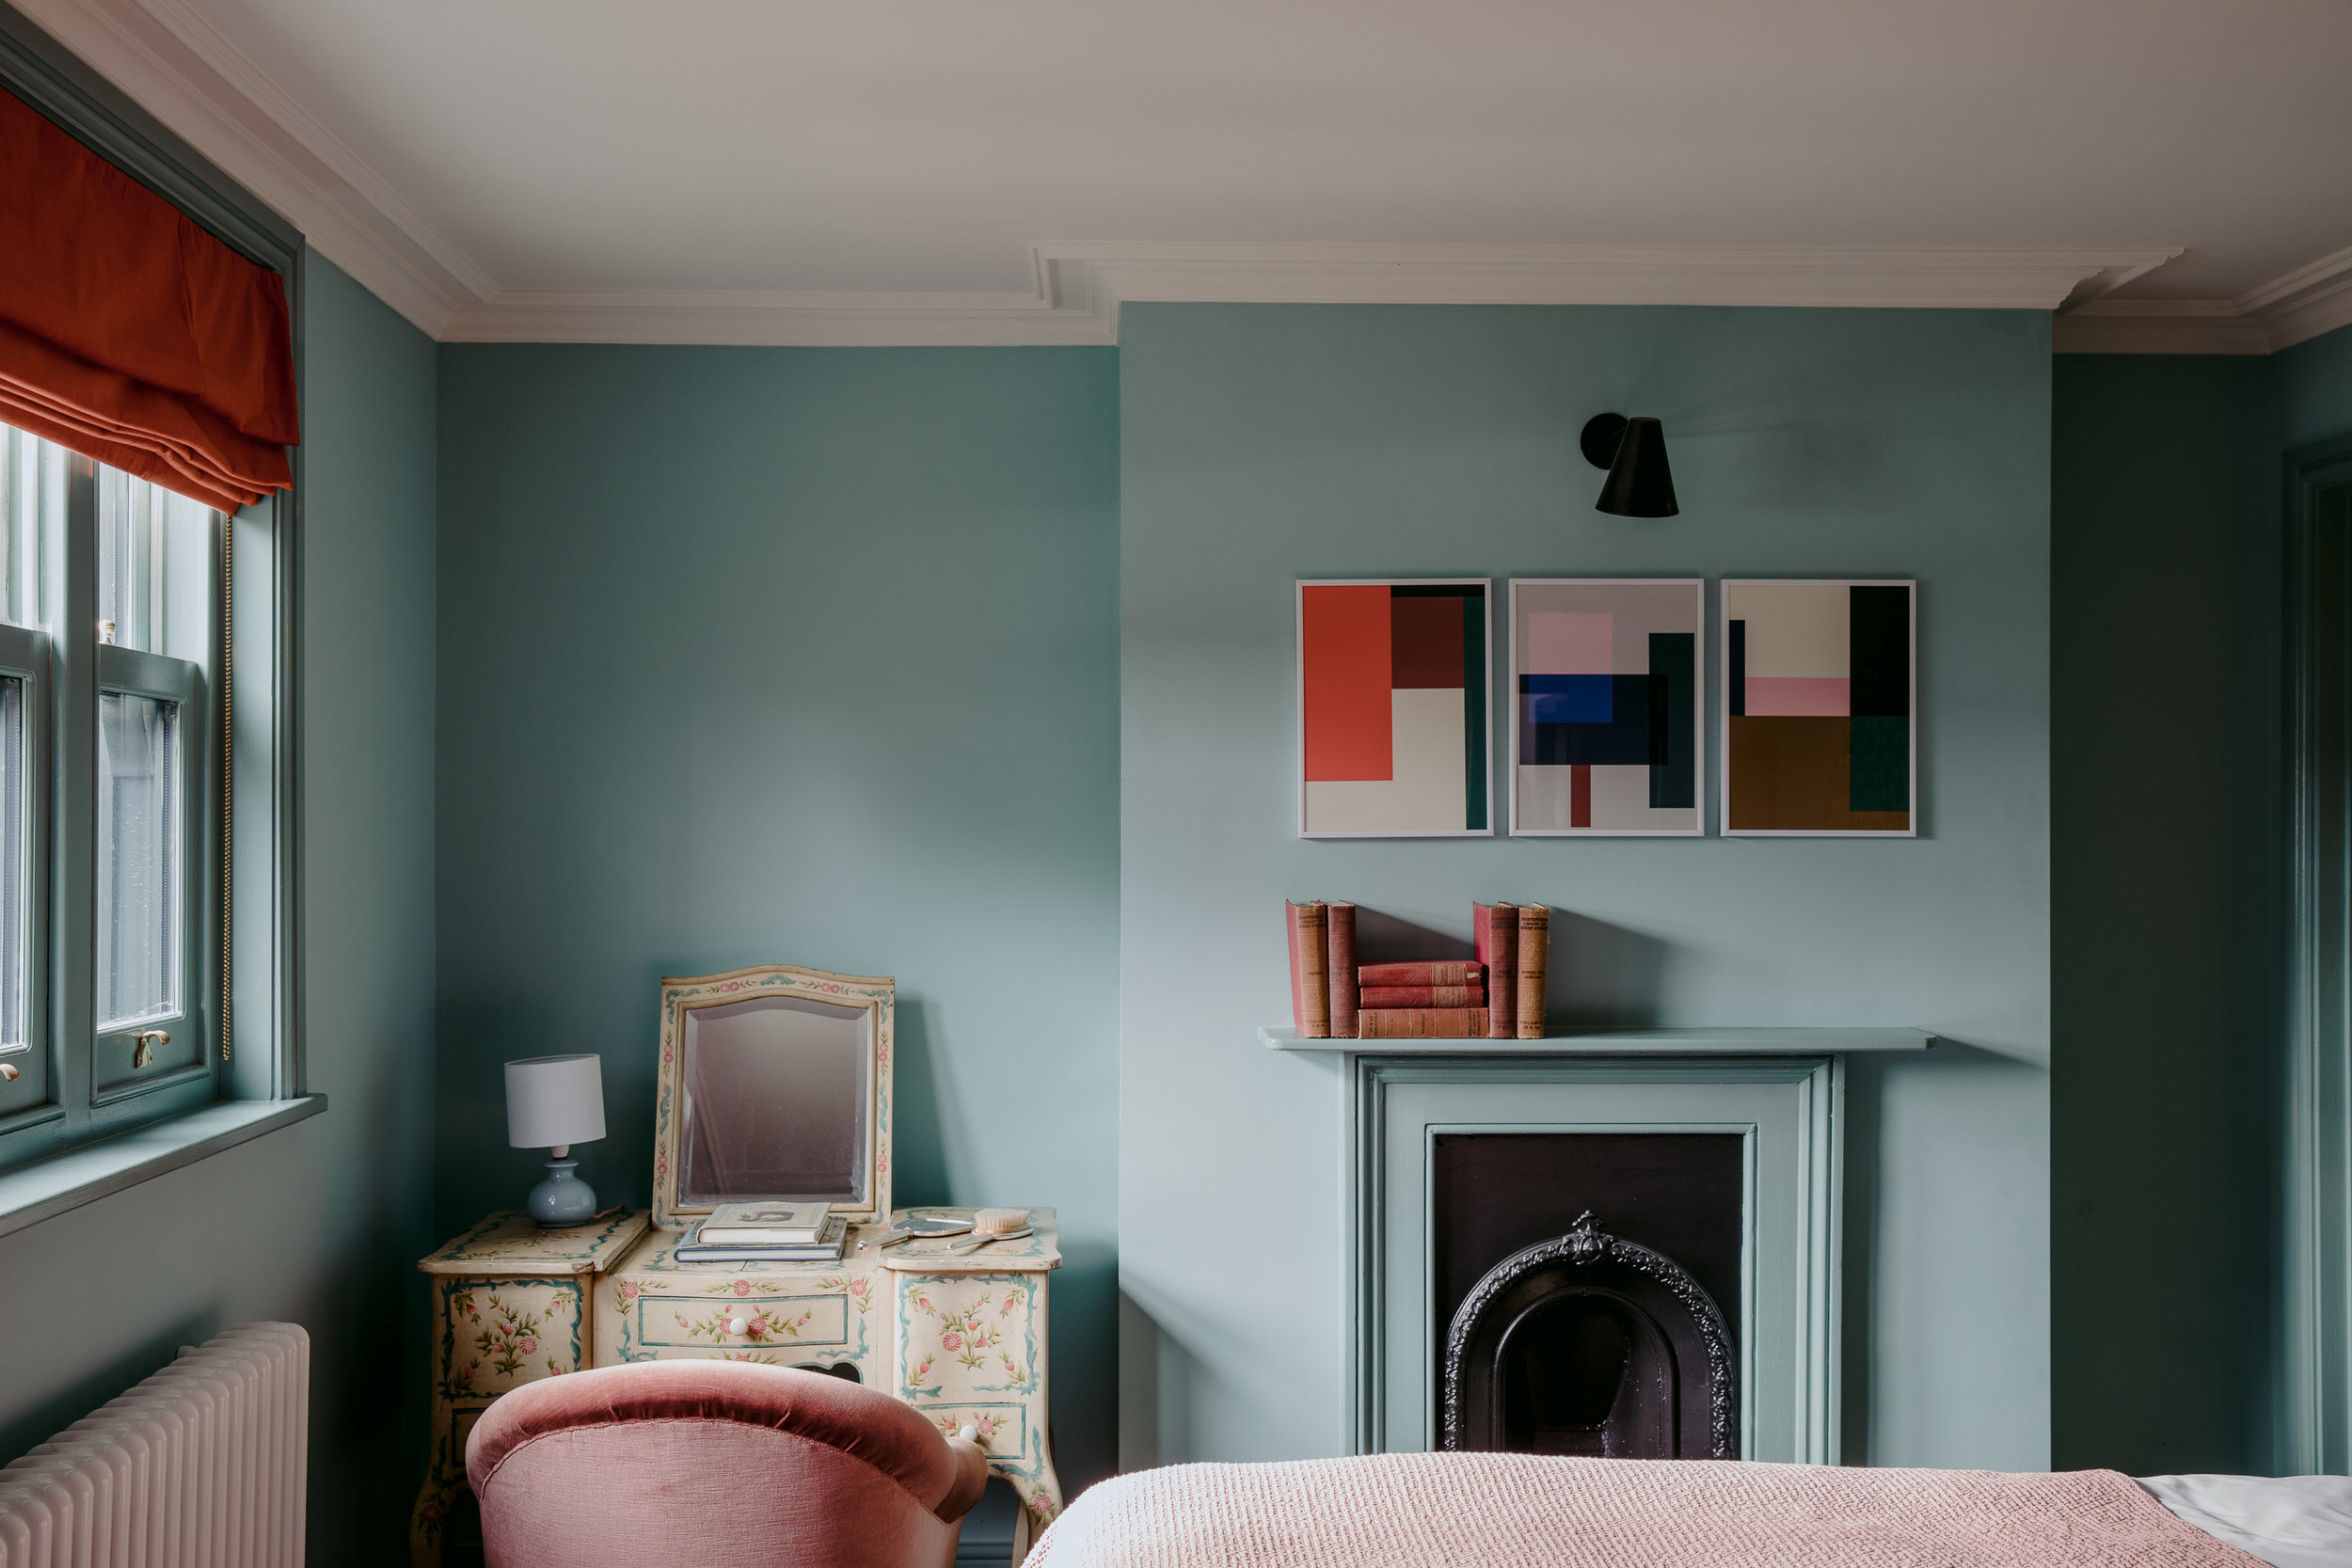 deal-hotel-the-rose-kent-coast-interior-design-support-local-magazine-styling-refurb-1-60g.jpg